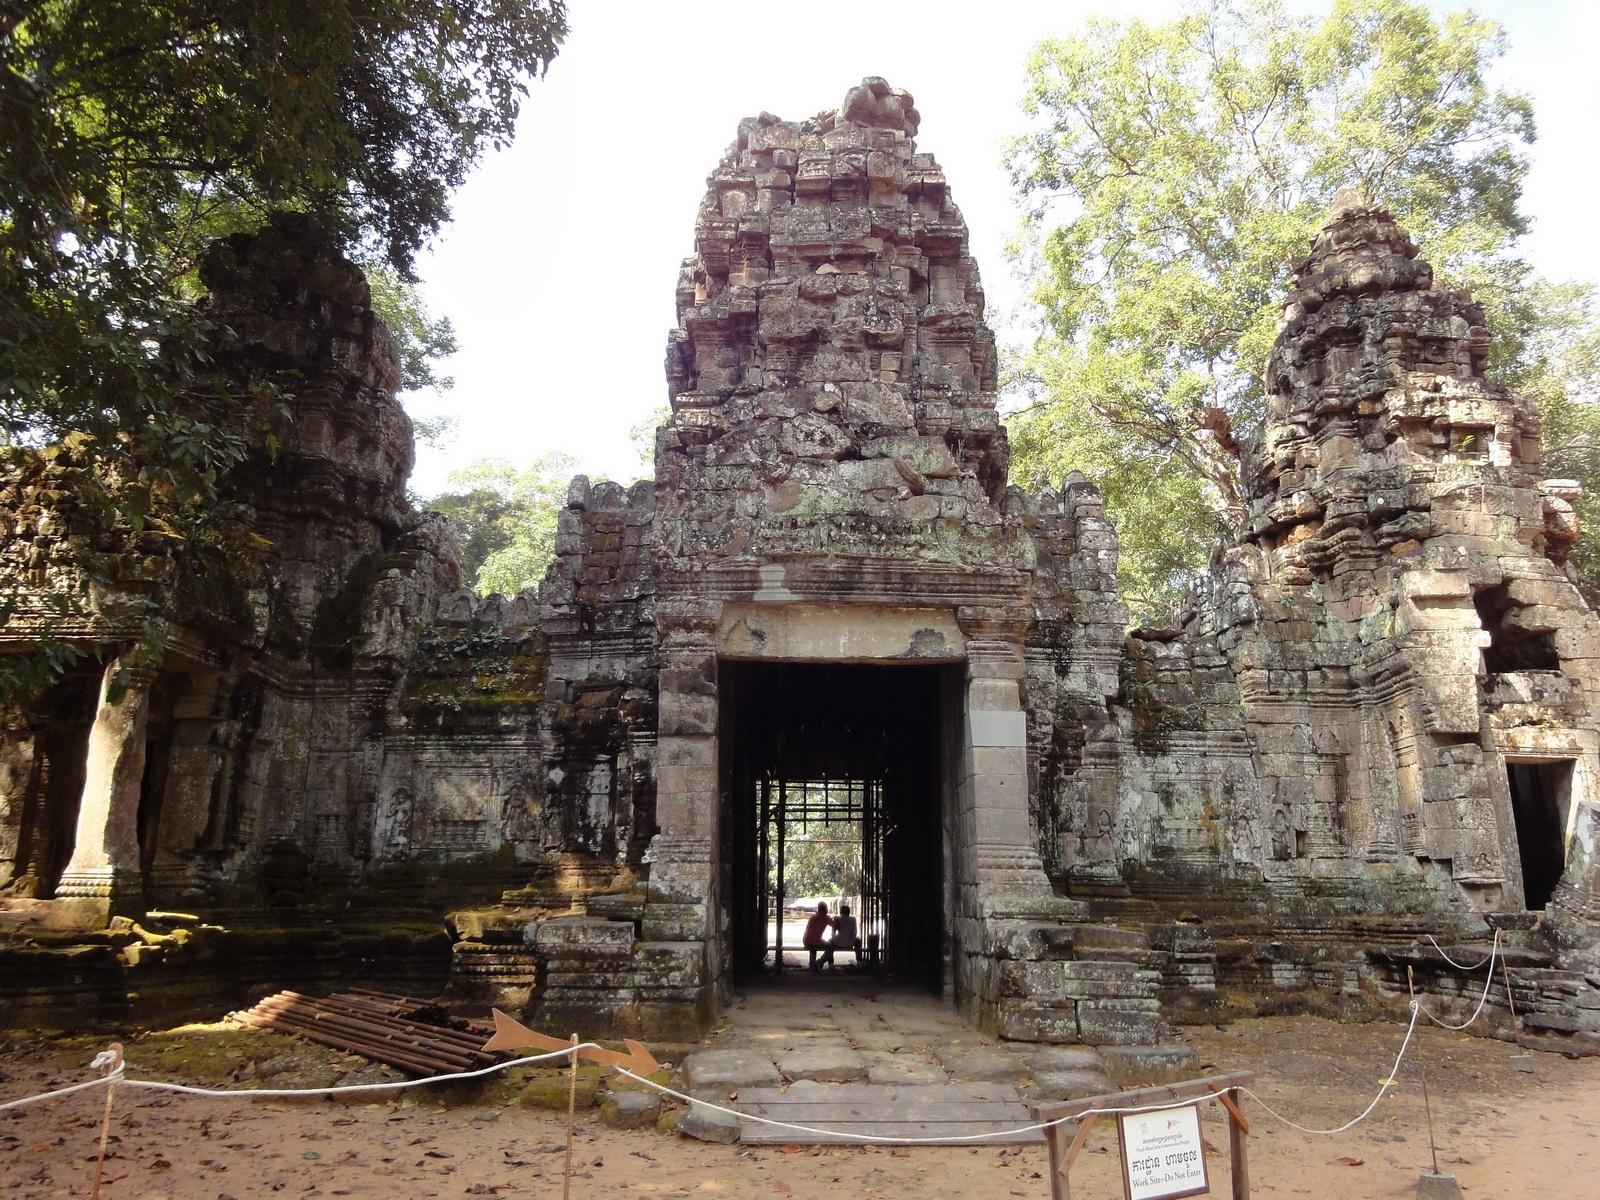 Preah Khan Temple west Gopuram entry tower naga bridge Angkor Thom 07